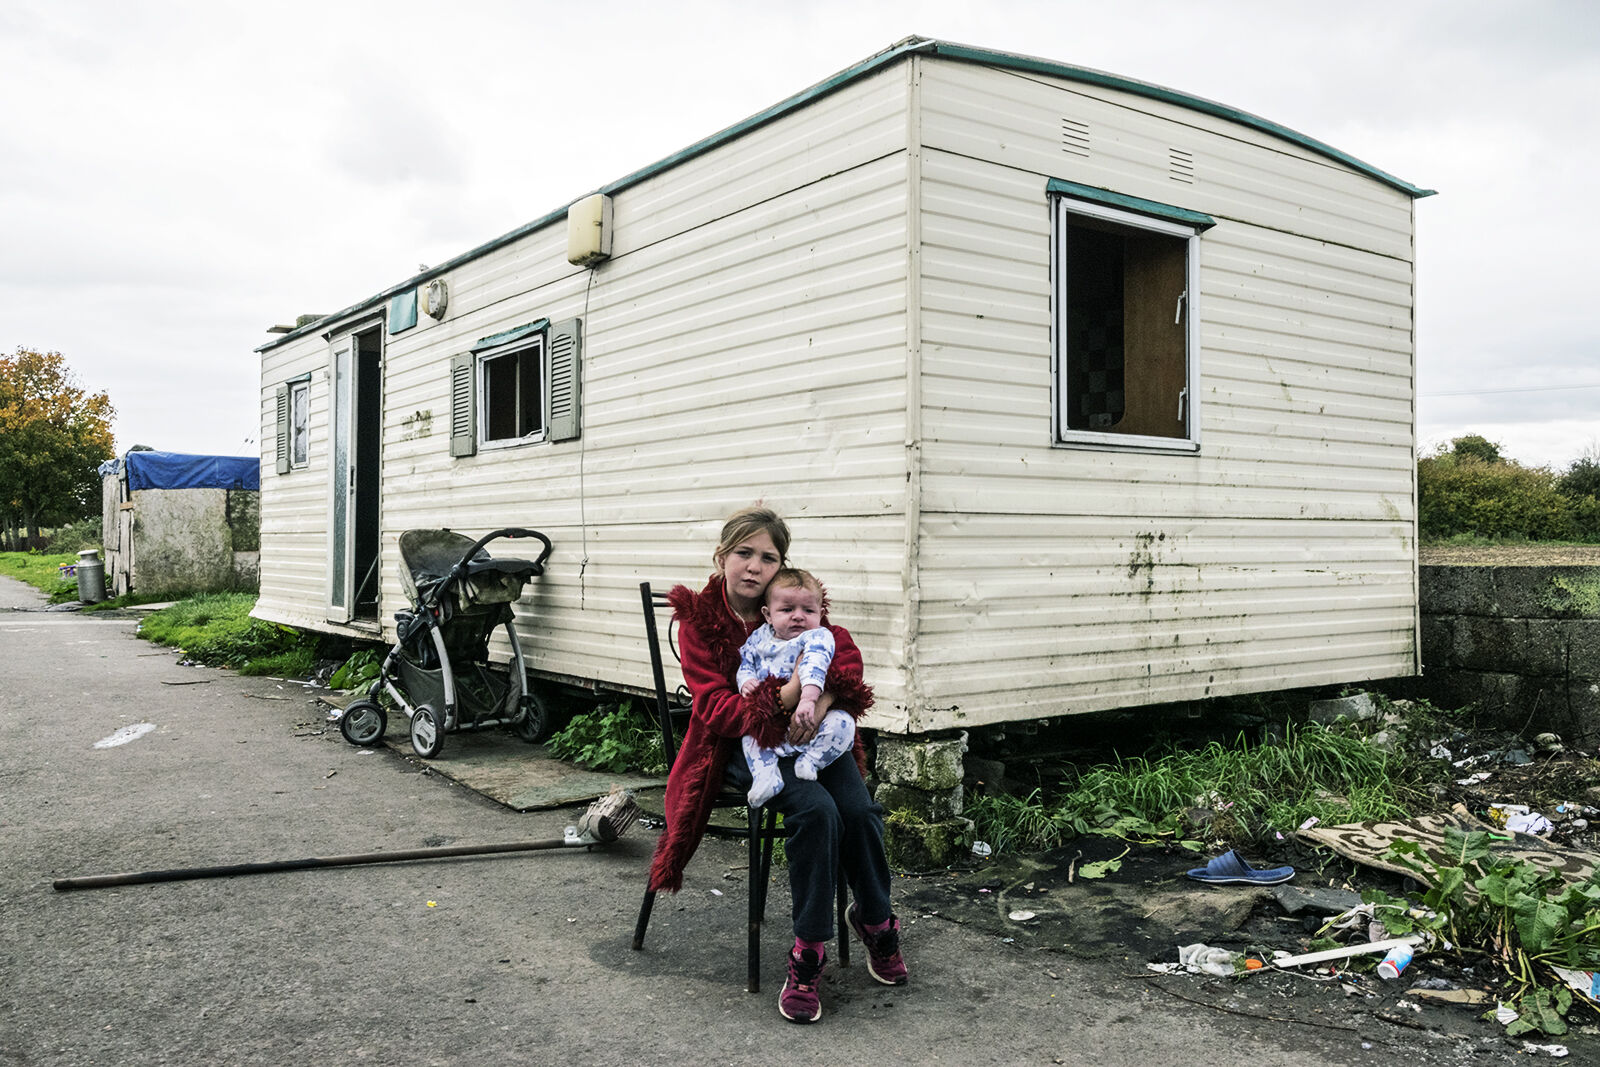 Mary and Mikey, Tipperary, Ireland 2018